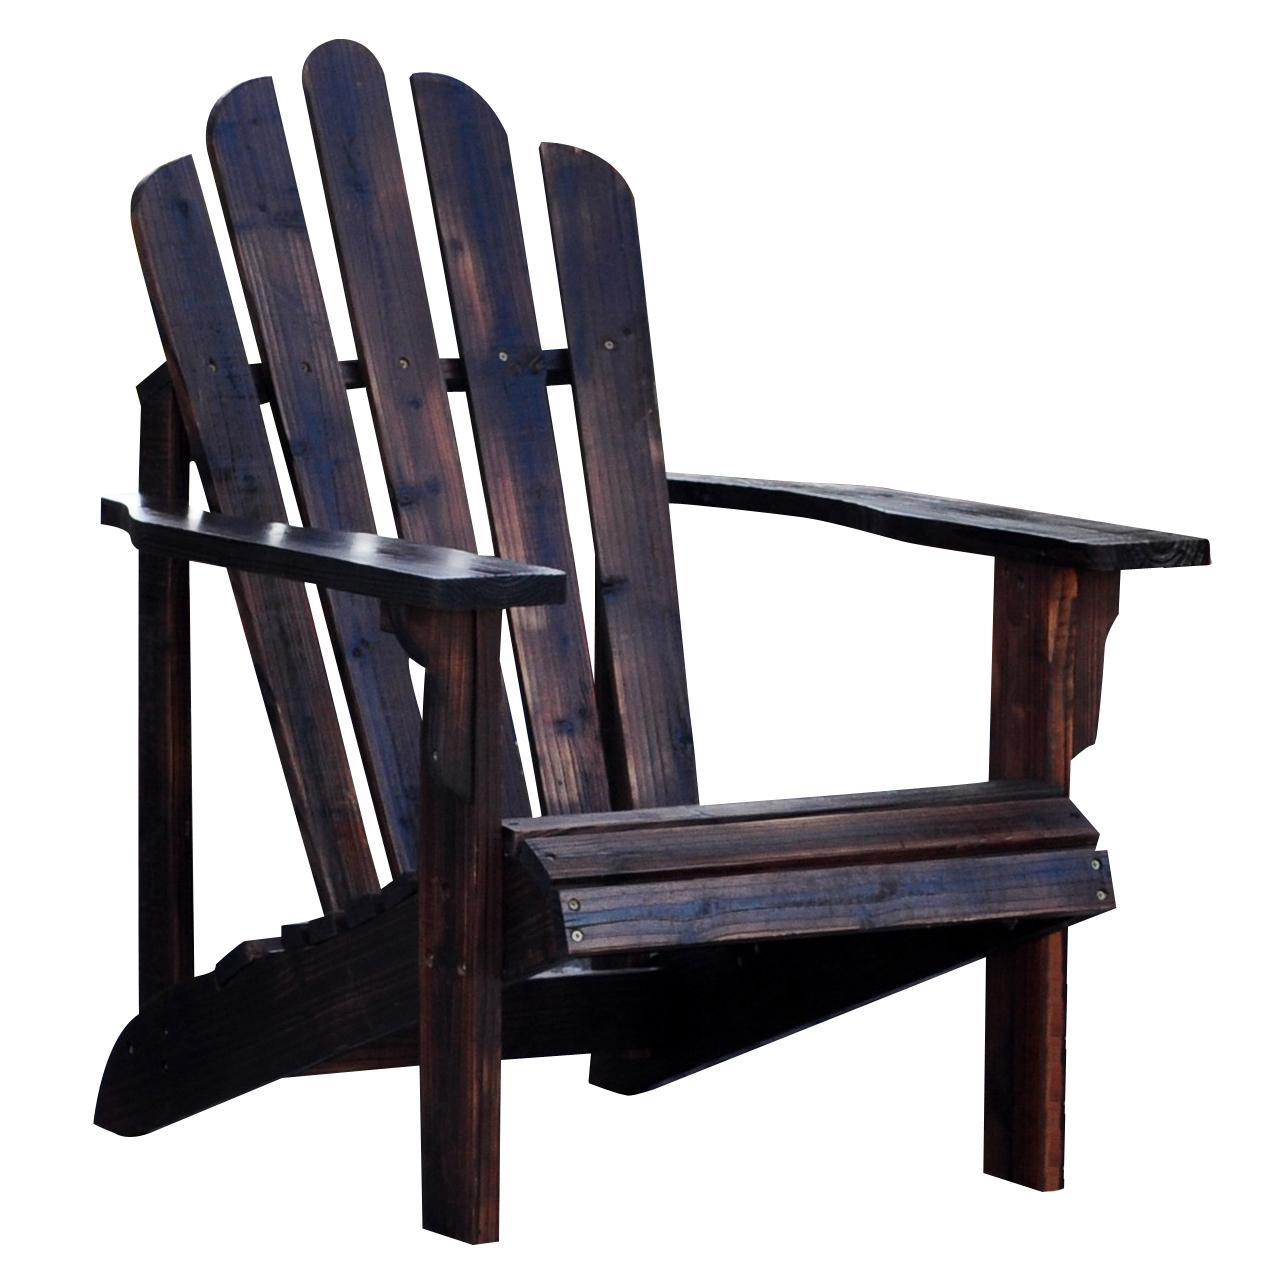 Westport Adirondack Chair Burnt Brown by Shine Company